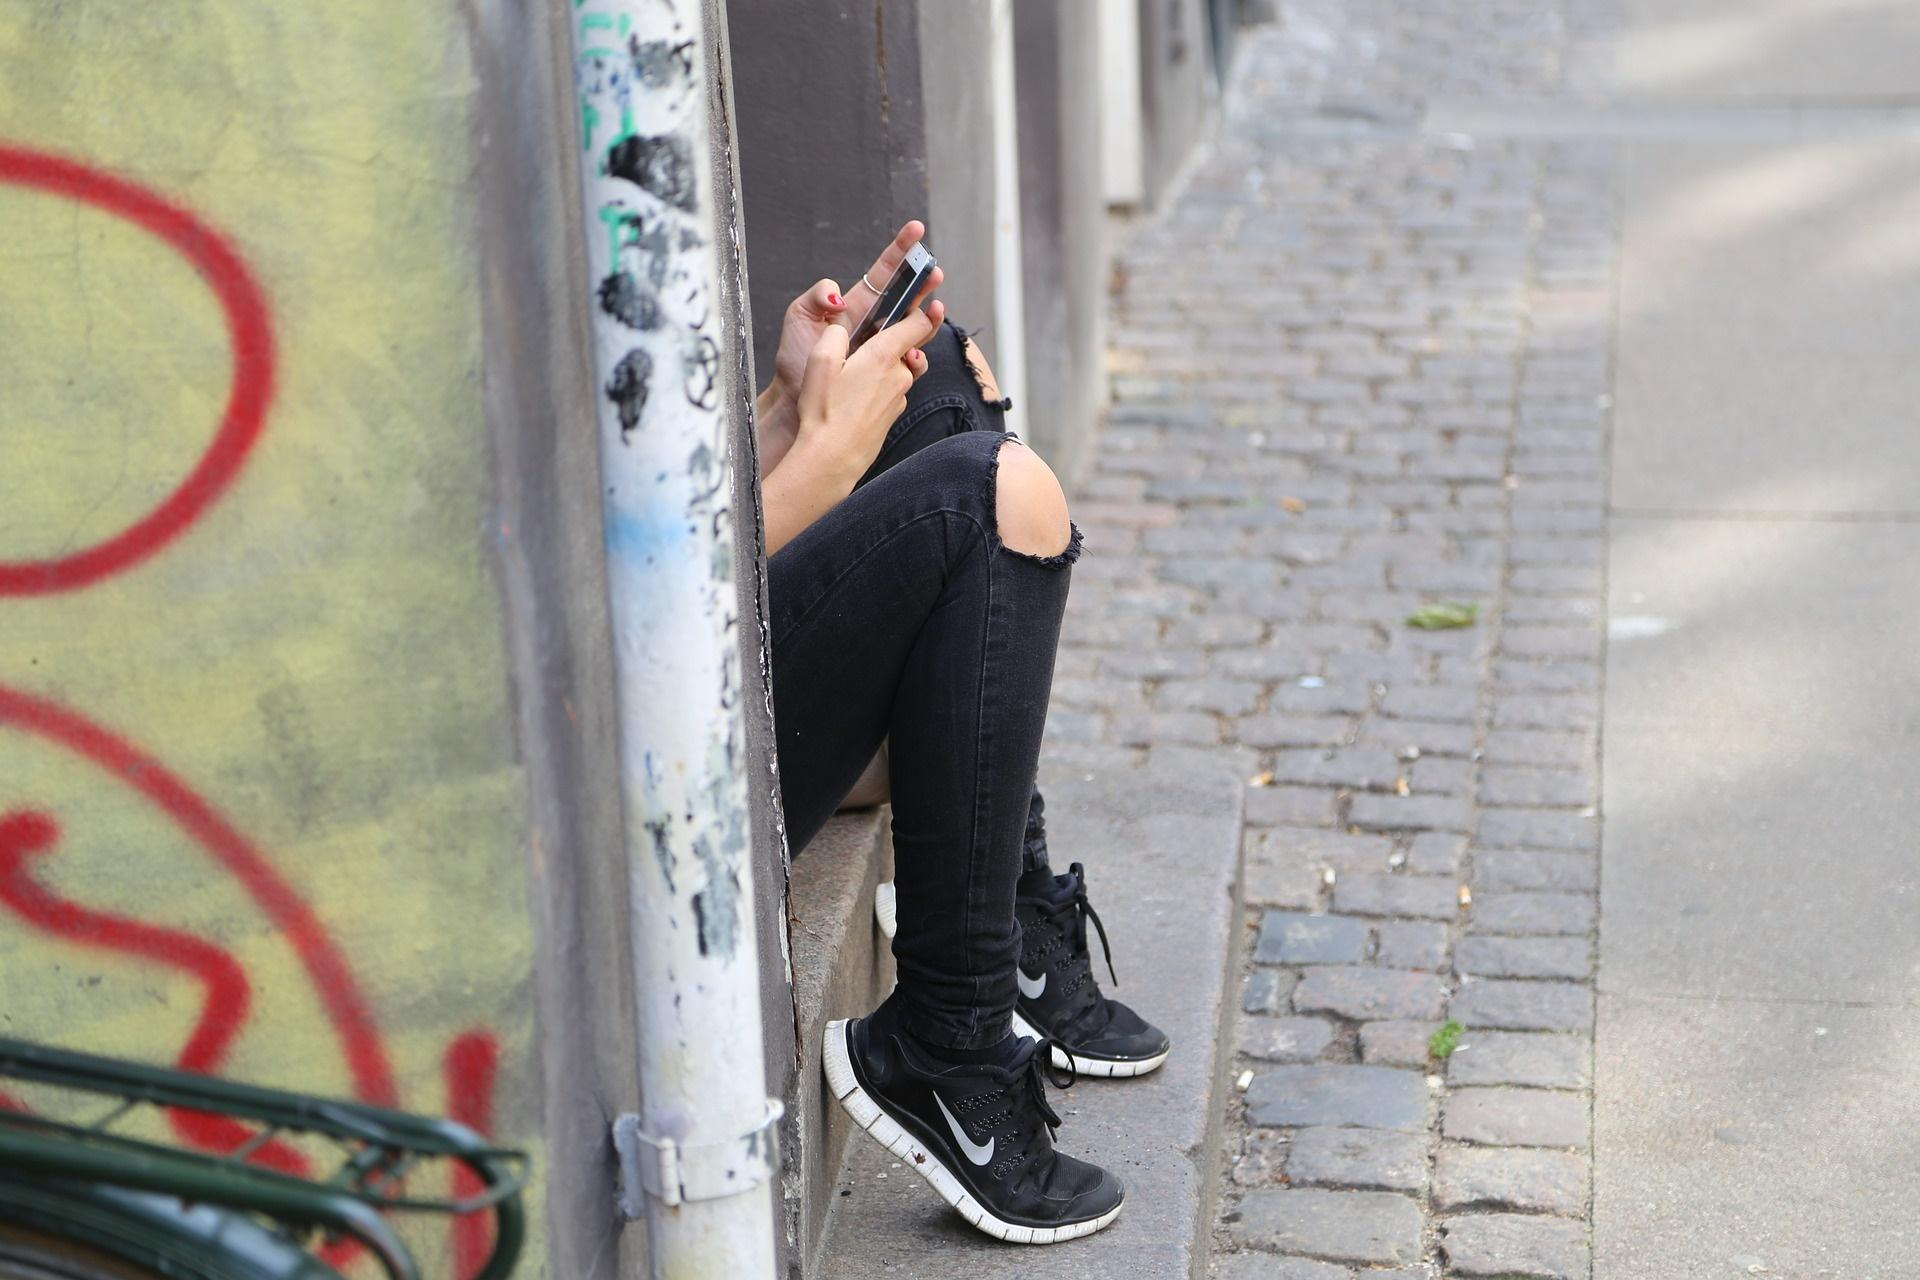 Chica sentada con móvil